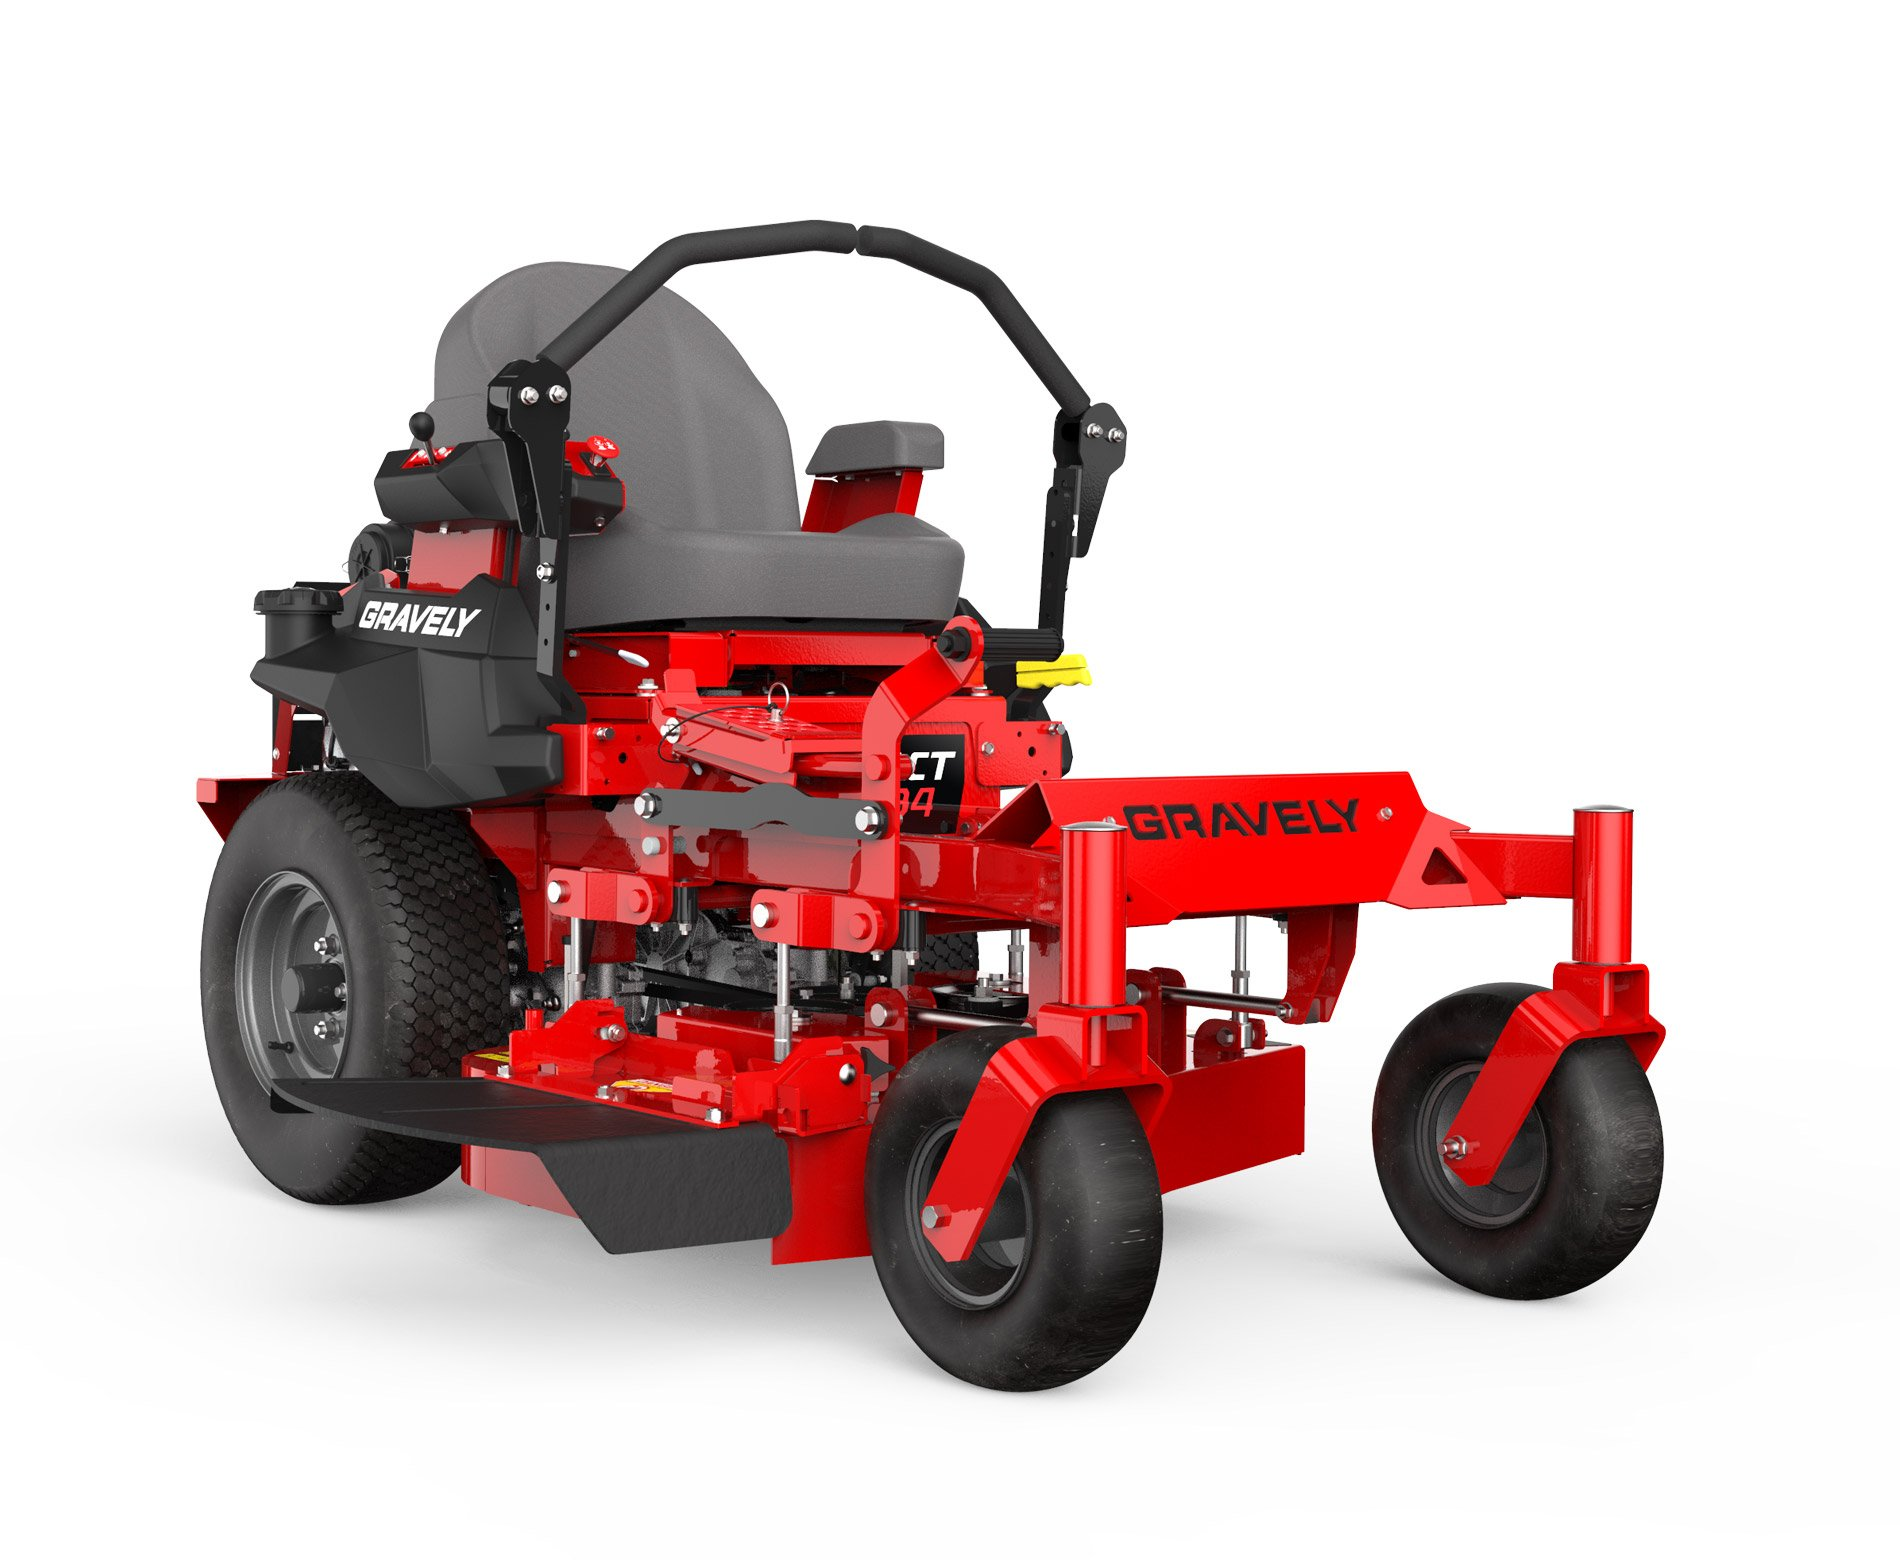 991088 Gravely Compact Pro 34 16HP Kawasaki FX481V Fab Deck 10cc pumps